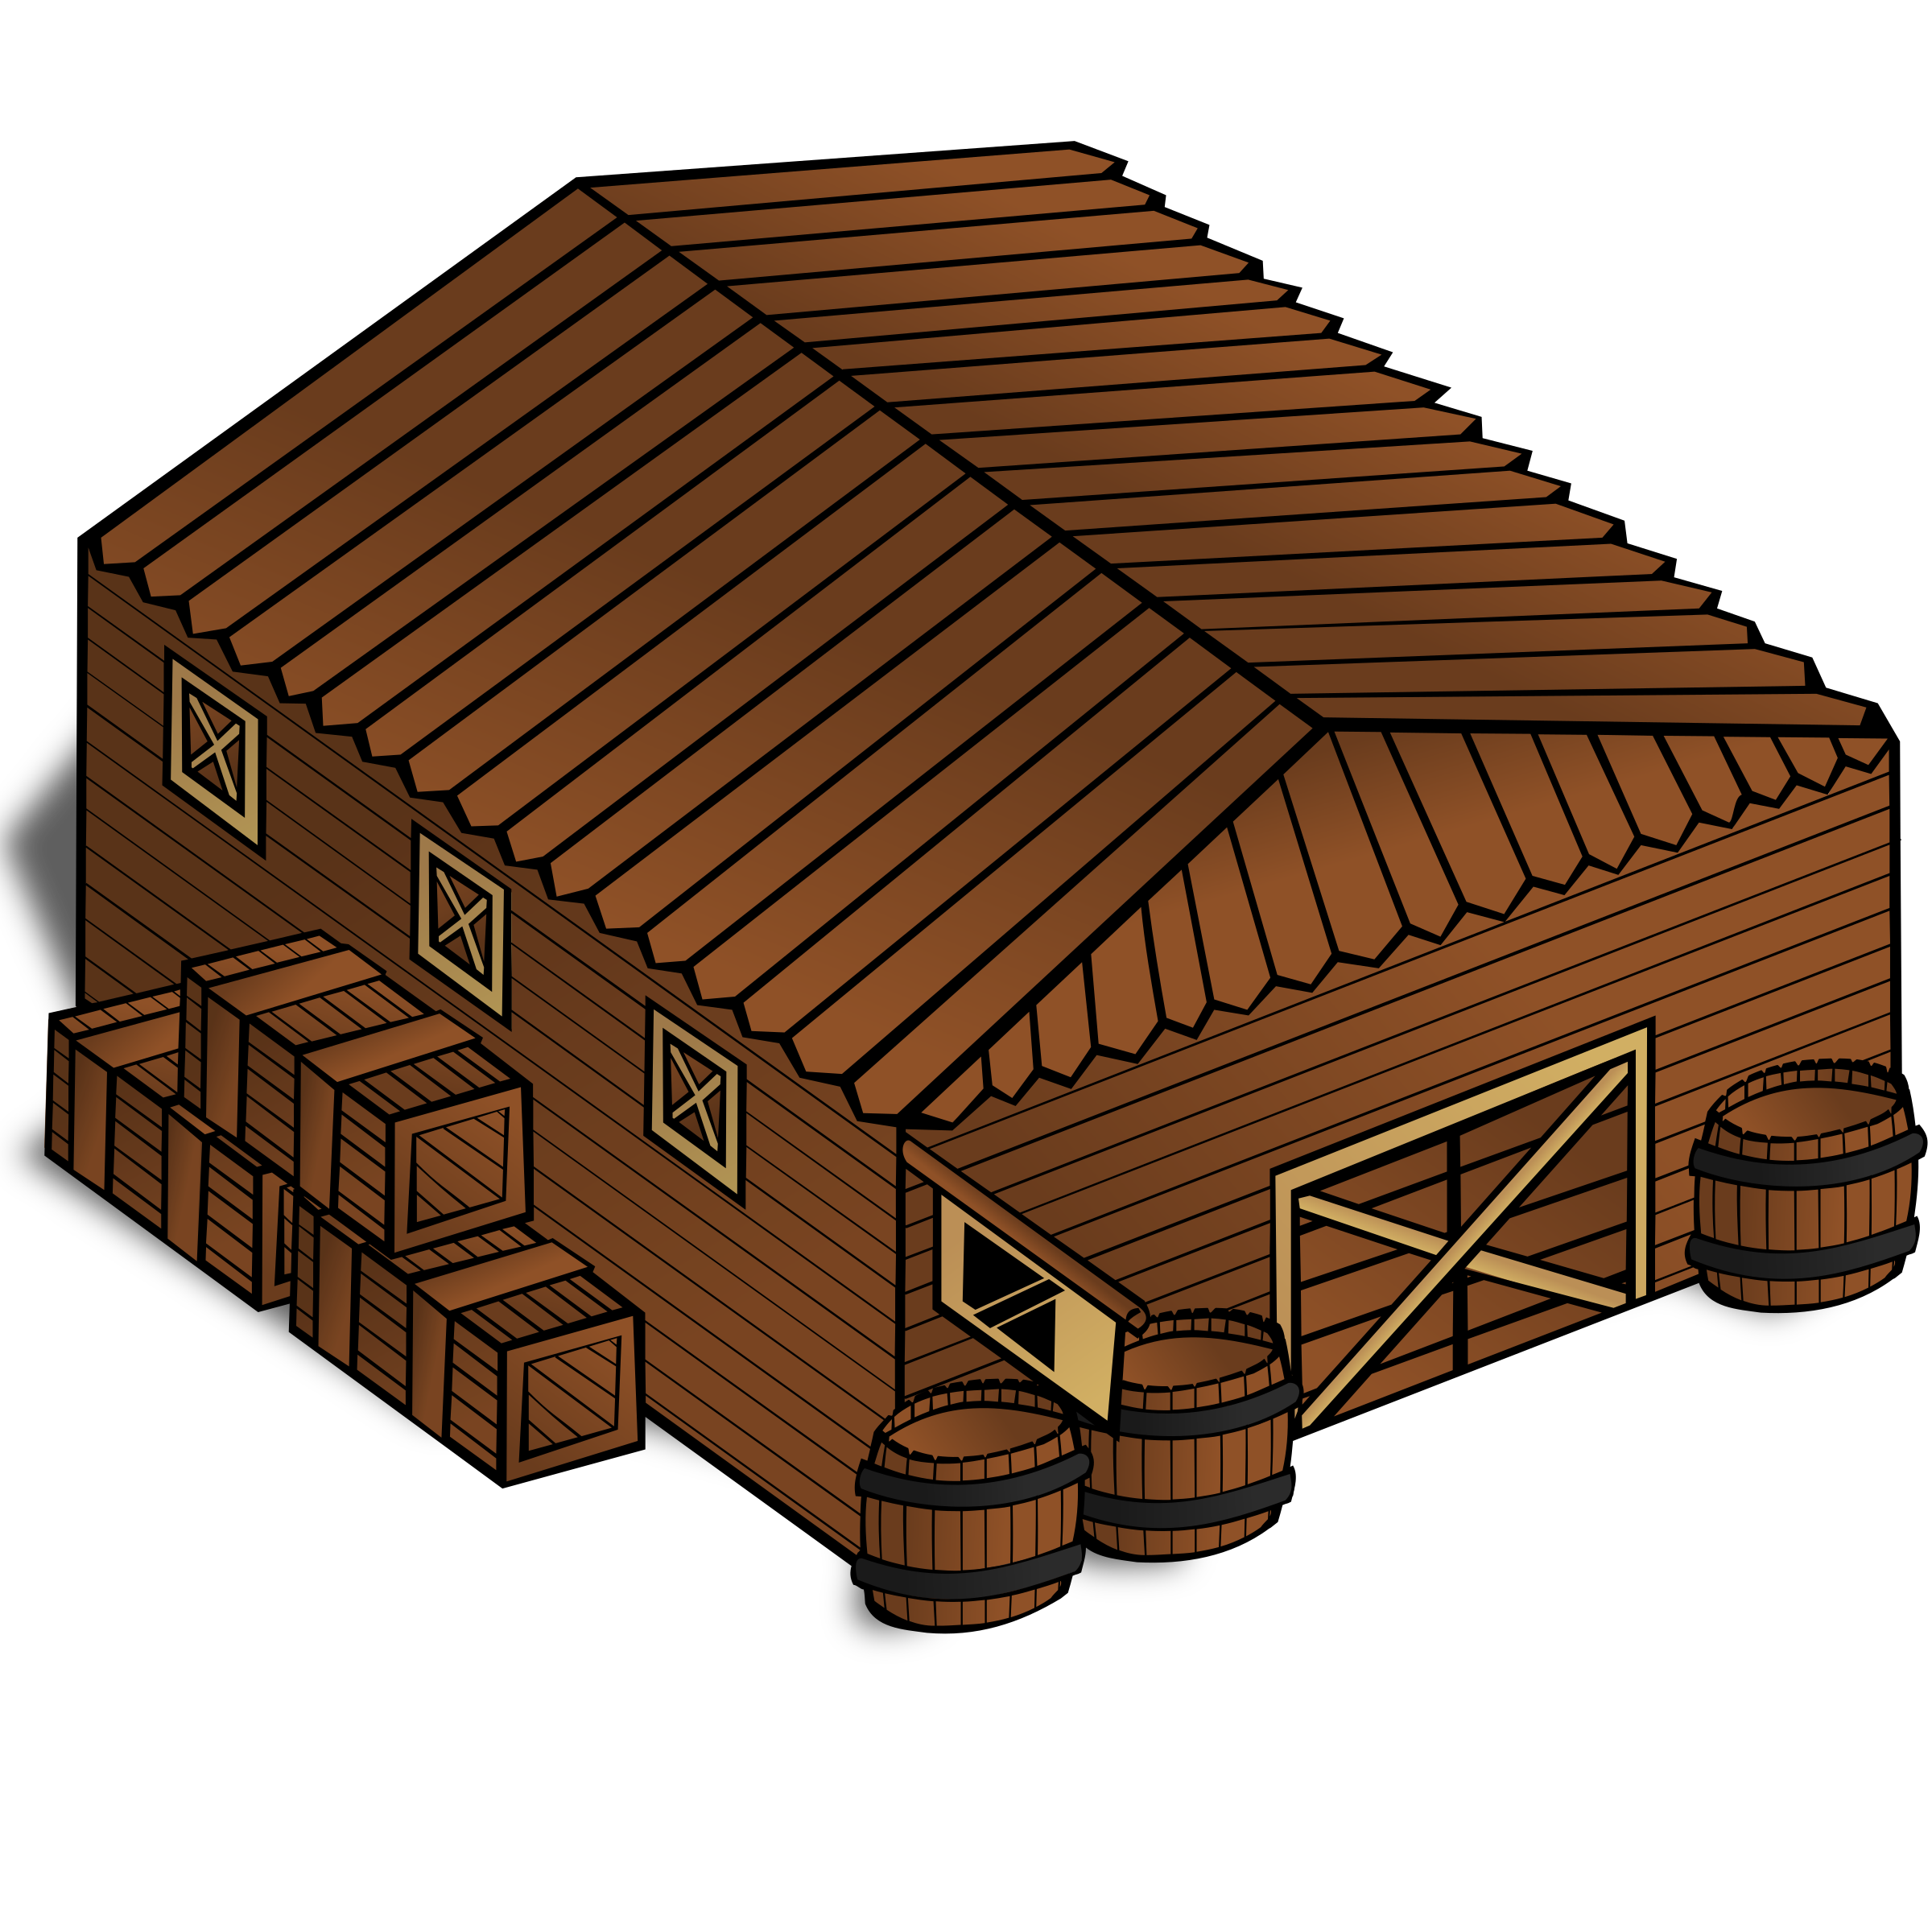 Warehouse clipart storage warehouse Clipart map Warehouse RPG symbols: